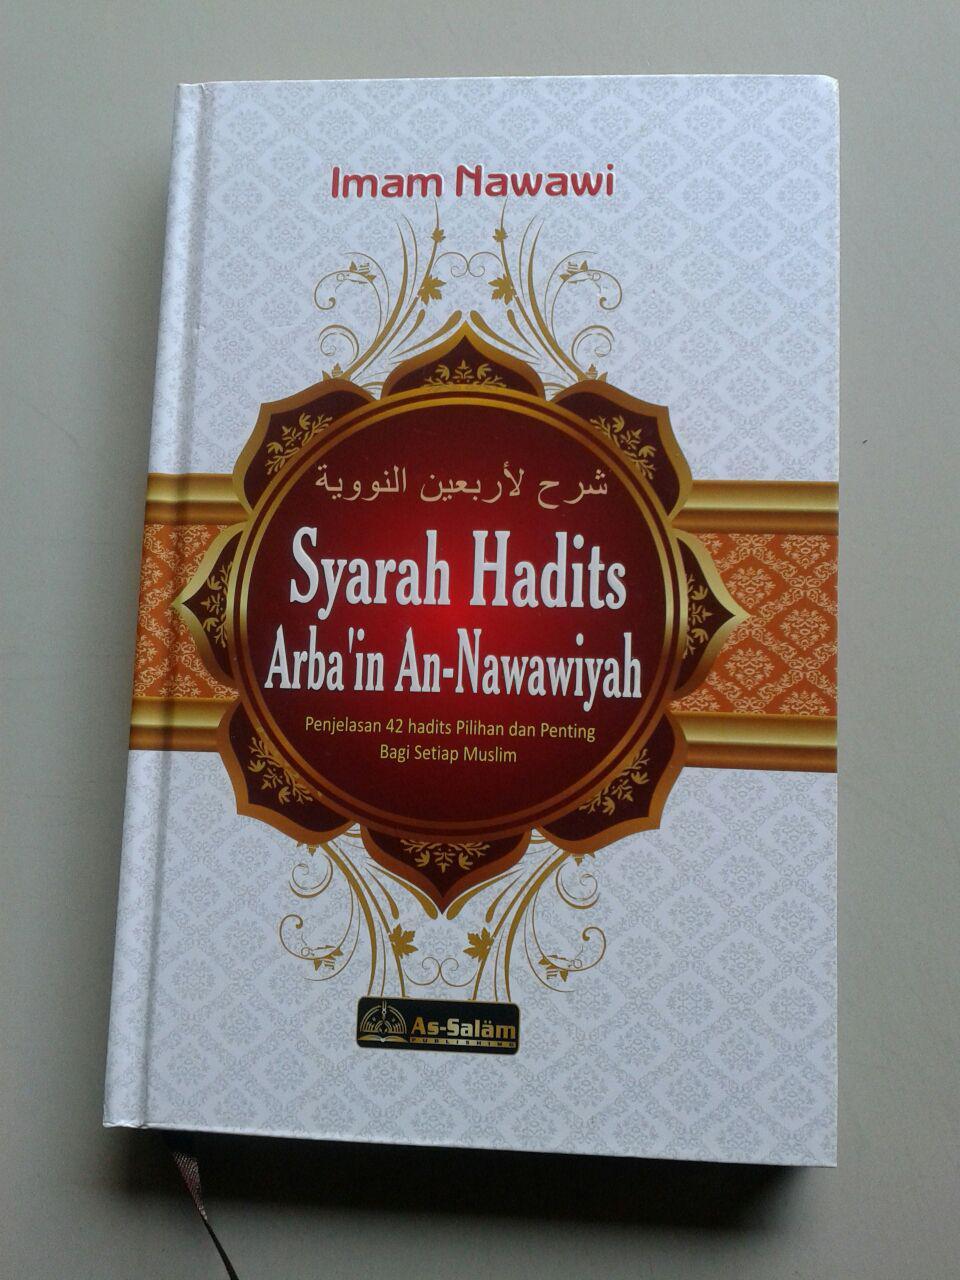 Buku Syarah Hadits Arba'in An-Nawawiyah cover 2